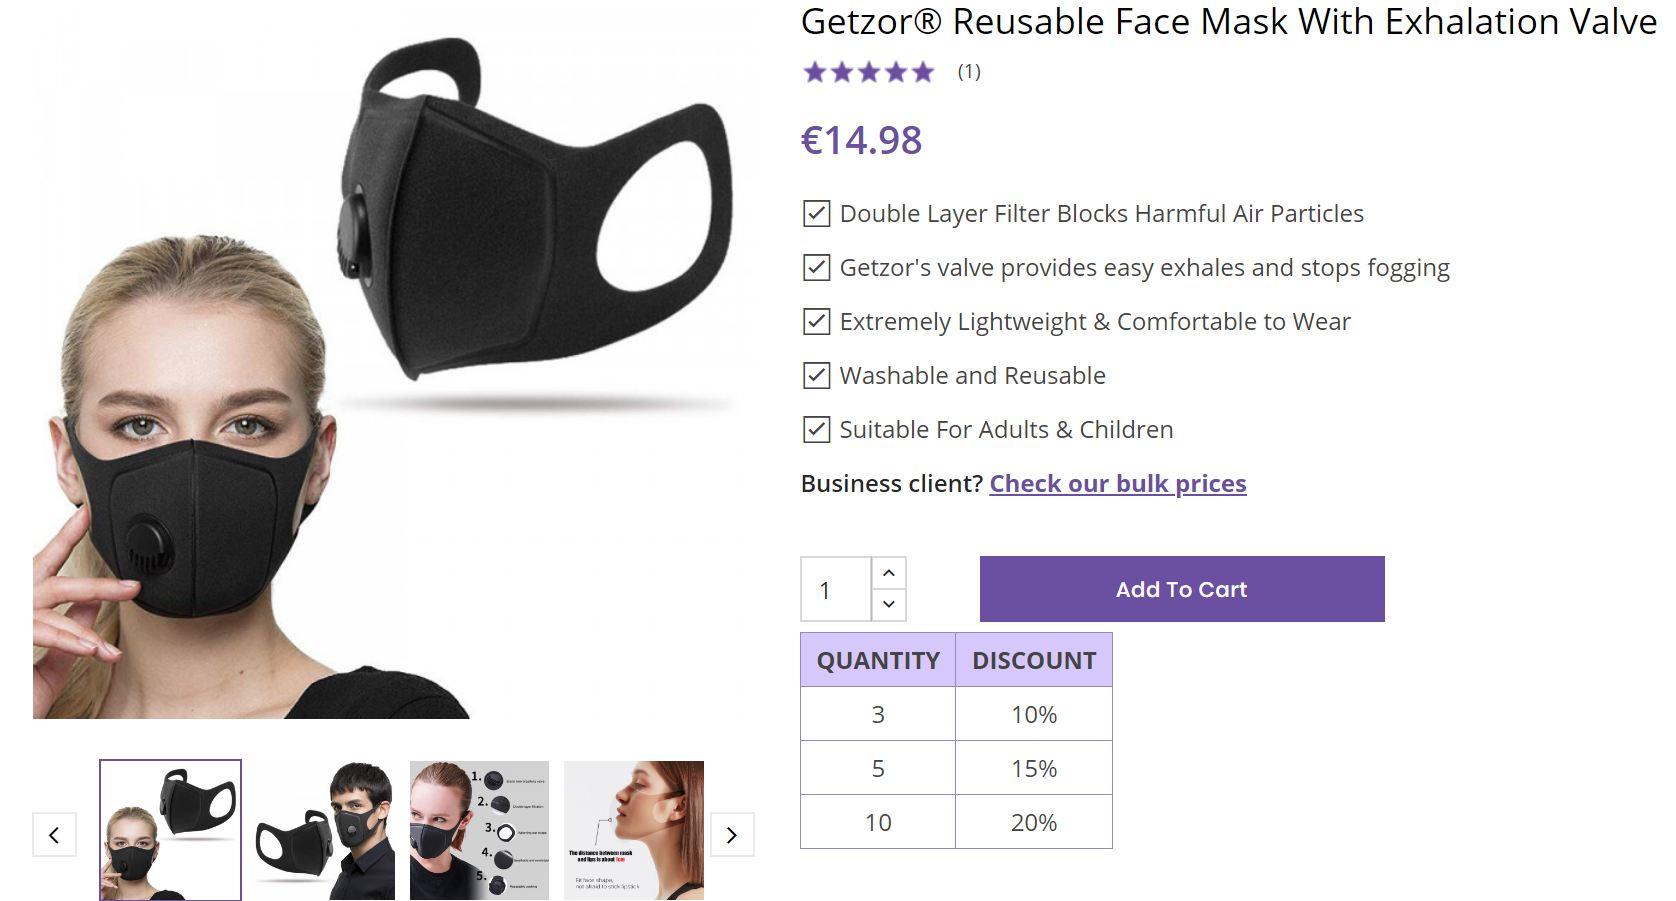 Getzor Face Mask